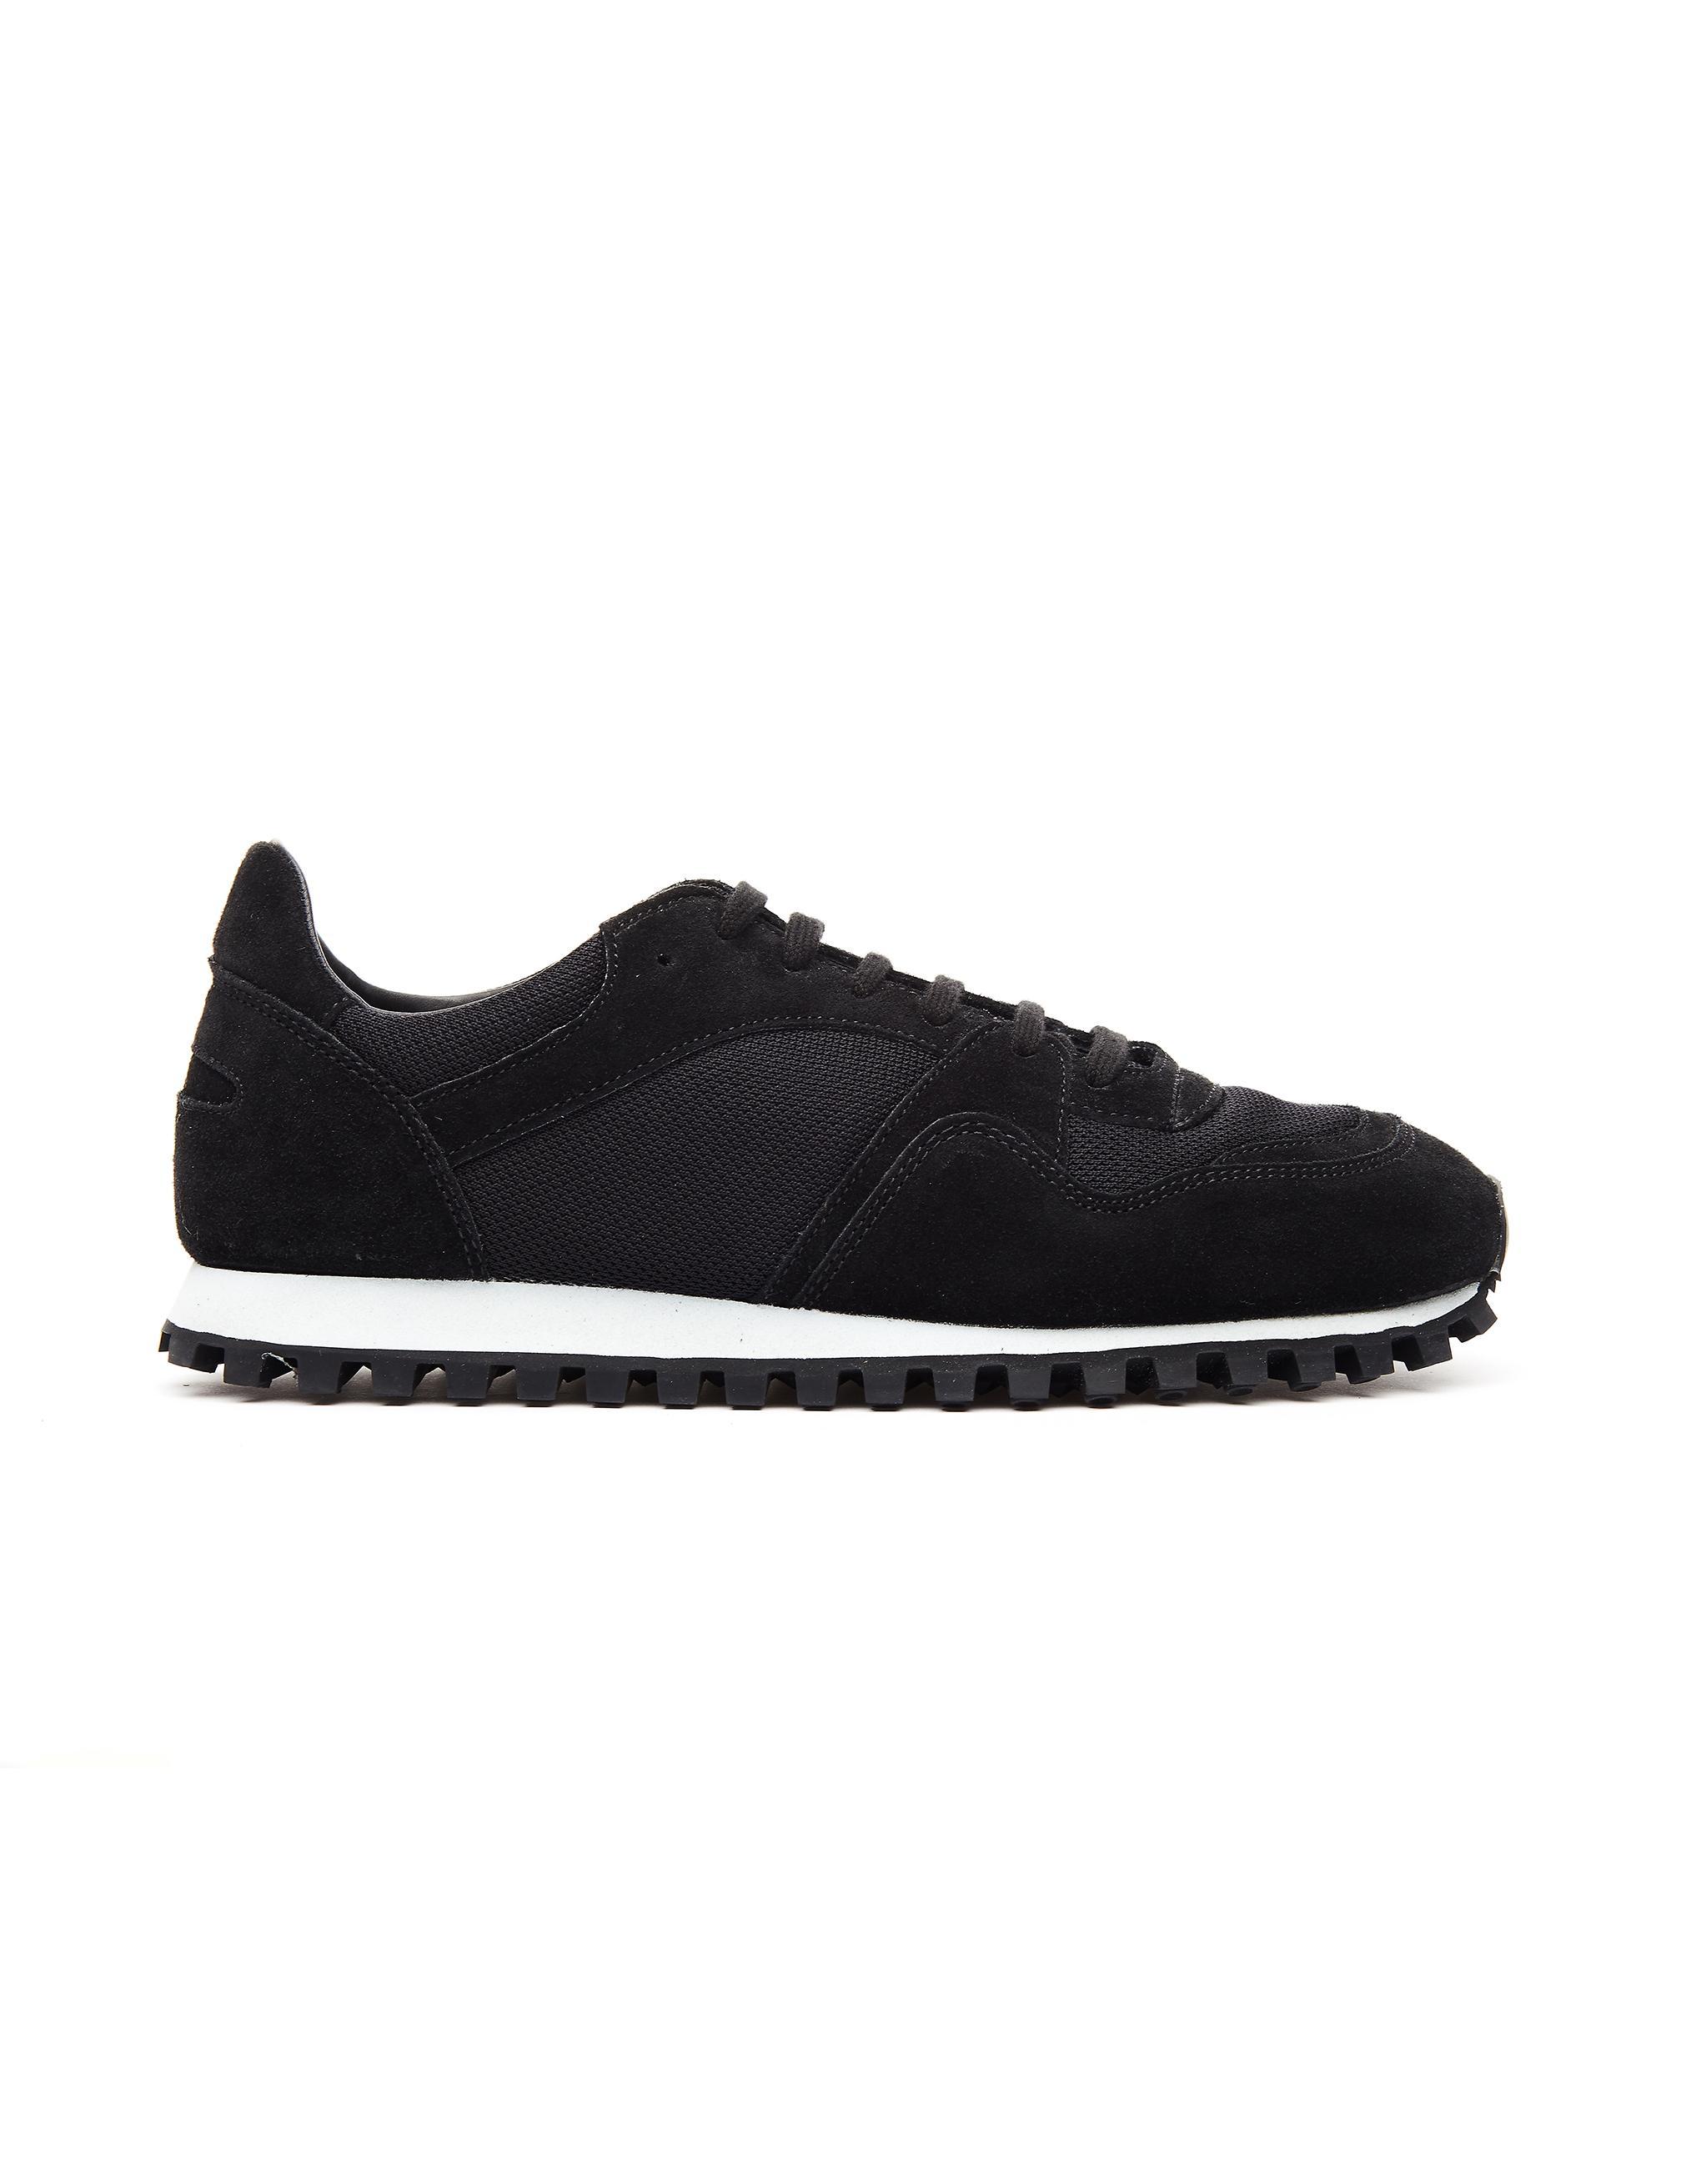 84554ff44c5d6b Spalwart Marathon Trail Low Black Sneakers In White